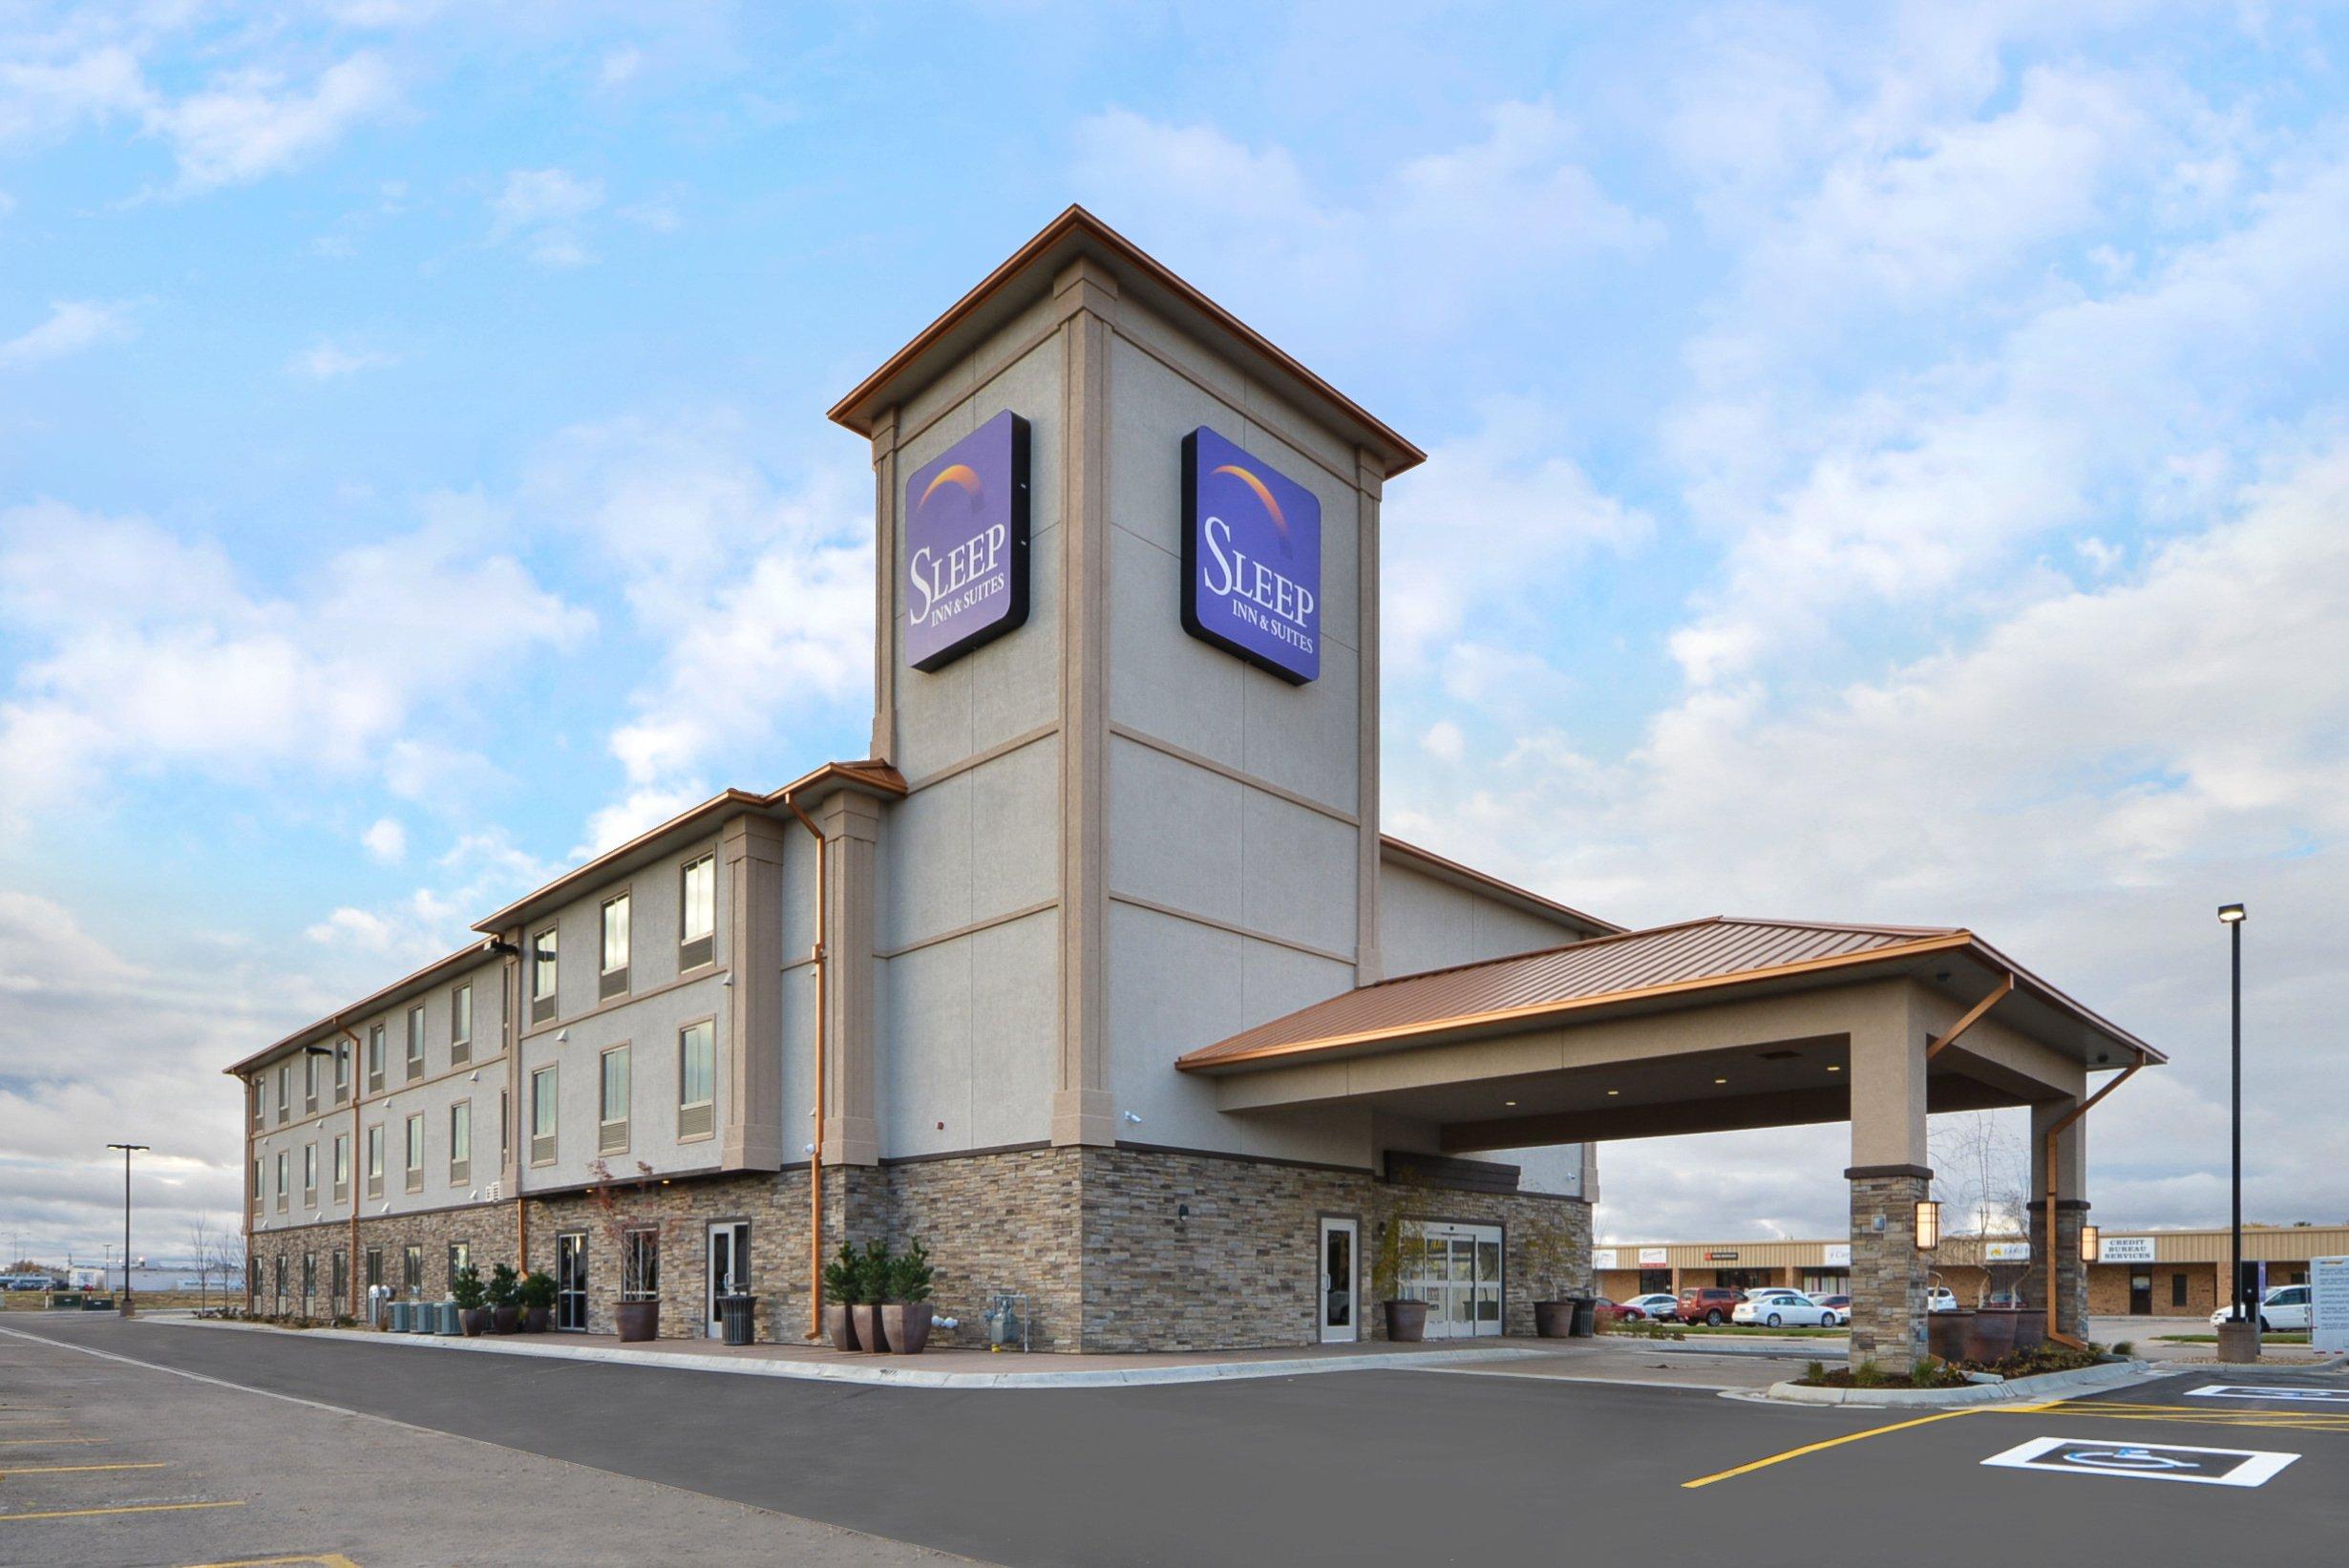 Sleep Inn and Suites Garden City Kansas